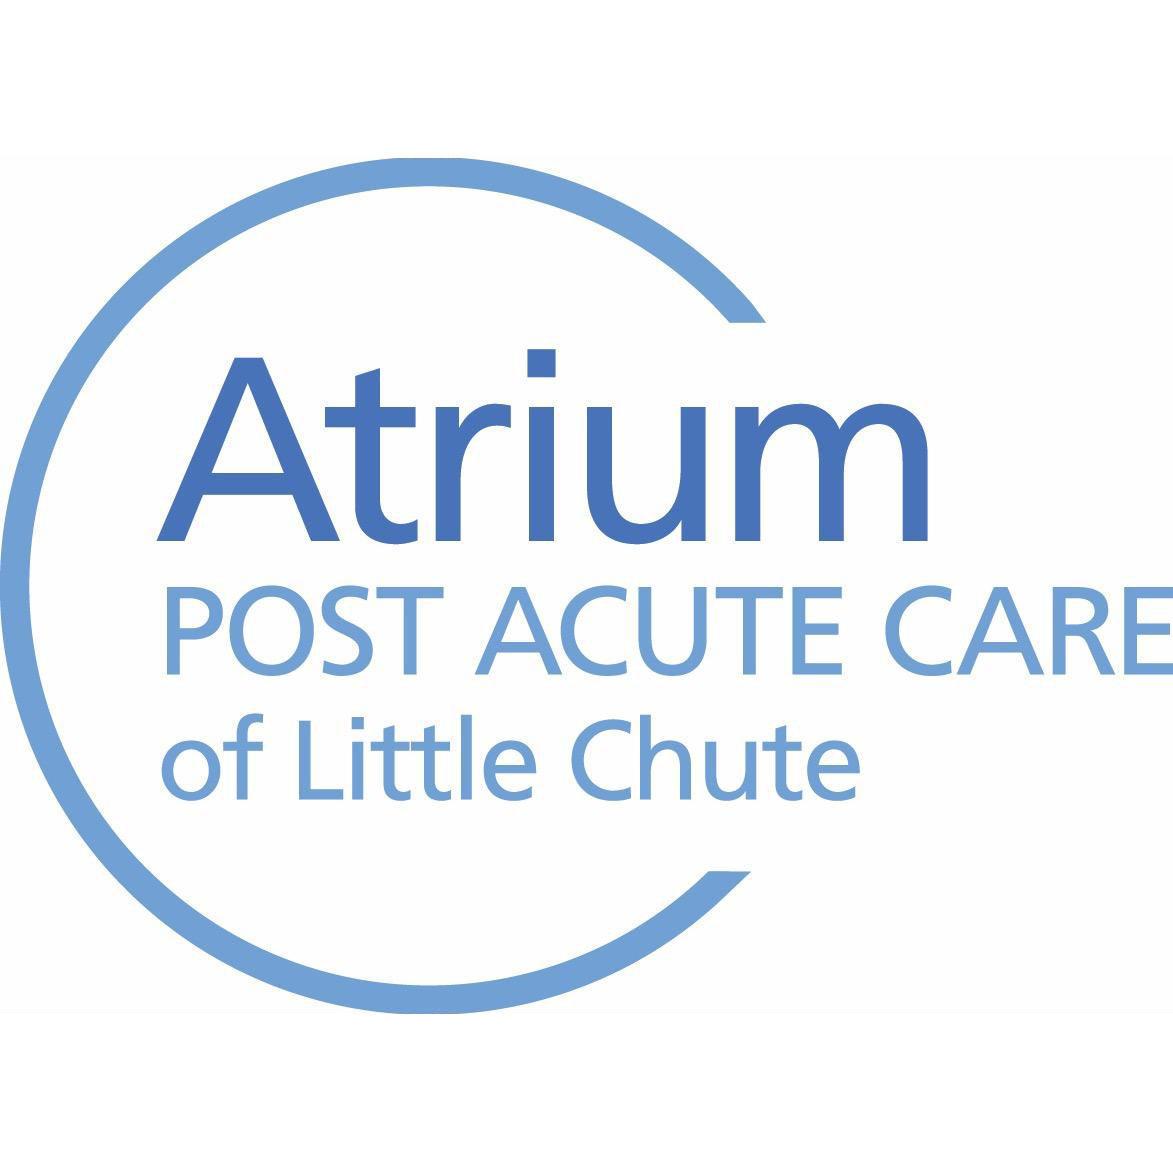 Atrium Post Acute Care of Little Chute - Little Chute, WI - Physical Medicine & Rehab